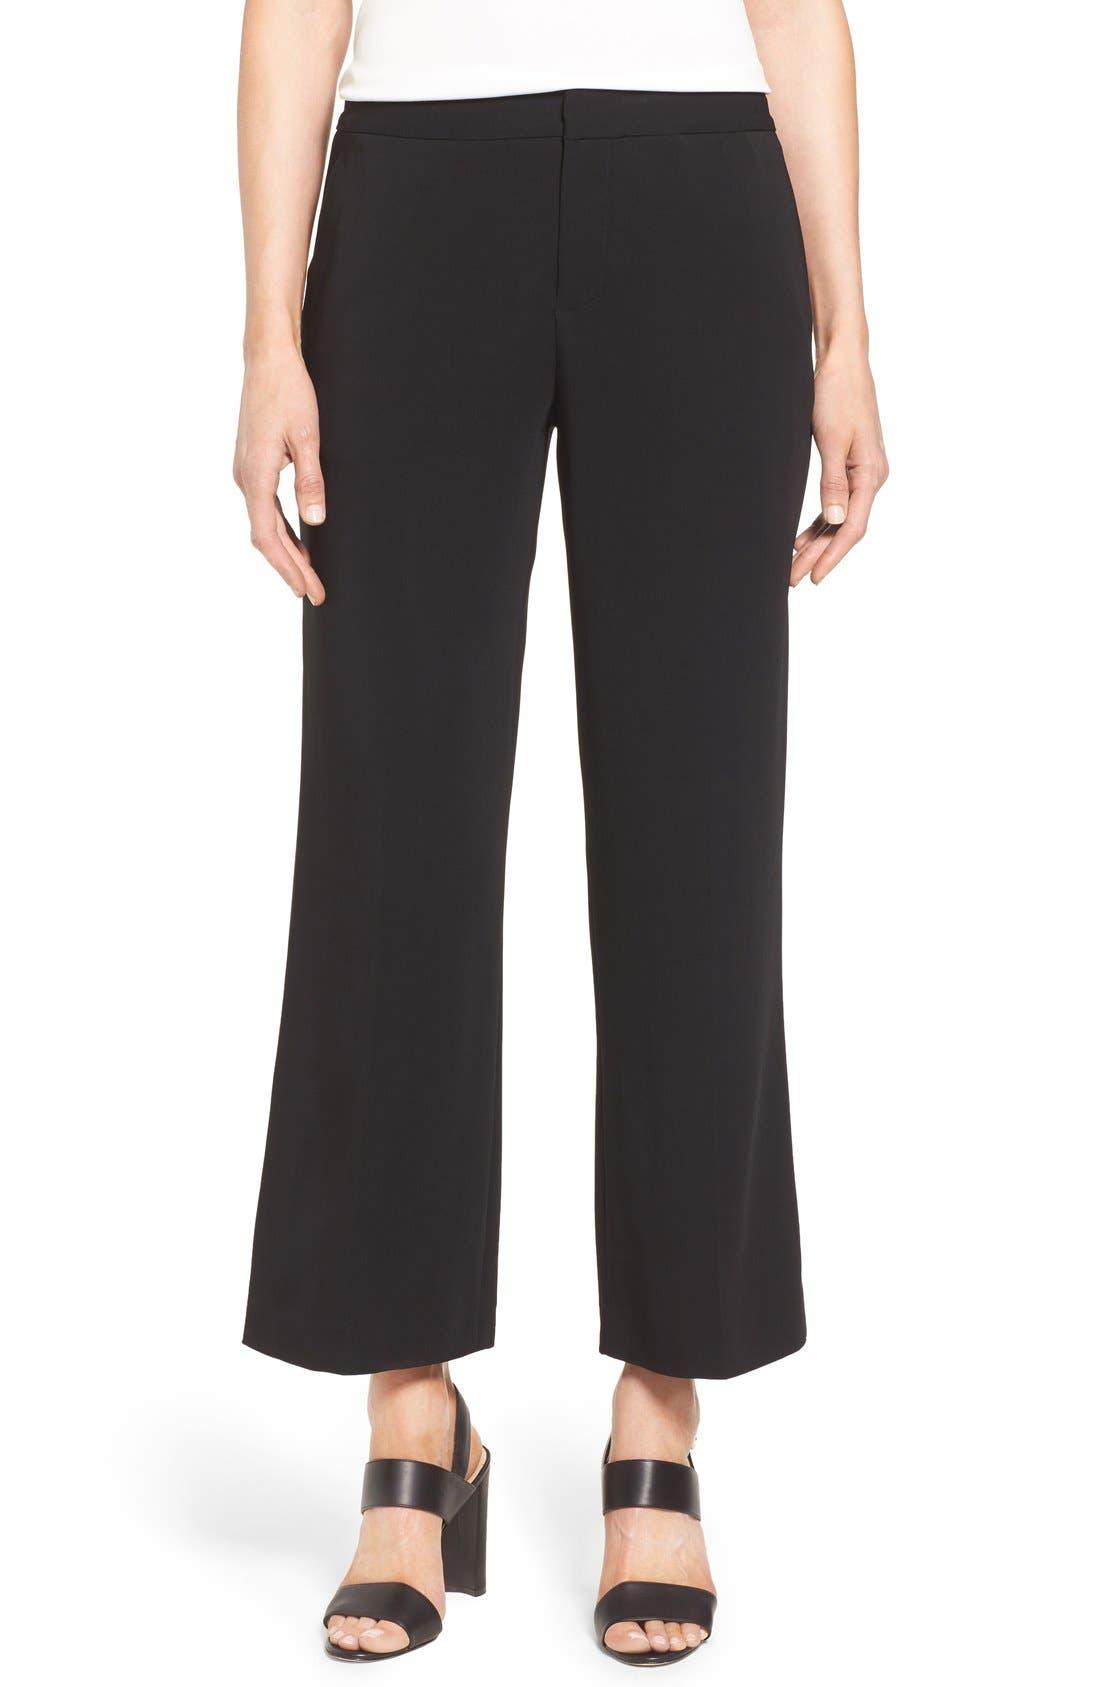 KOBI HALPERIN 'Clara' Crop Pants, Main, color, 001